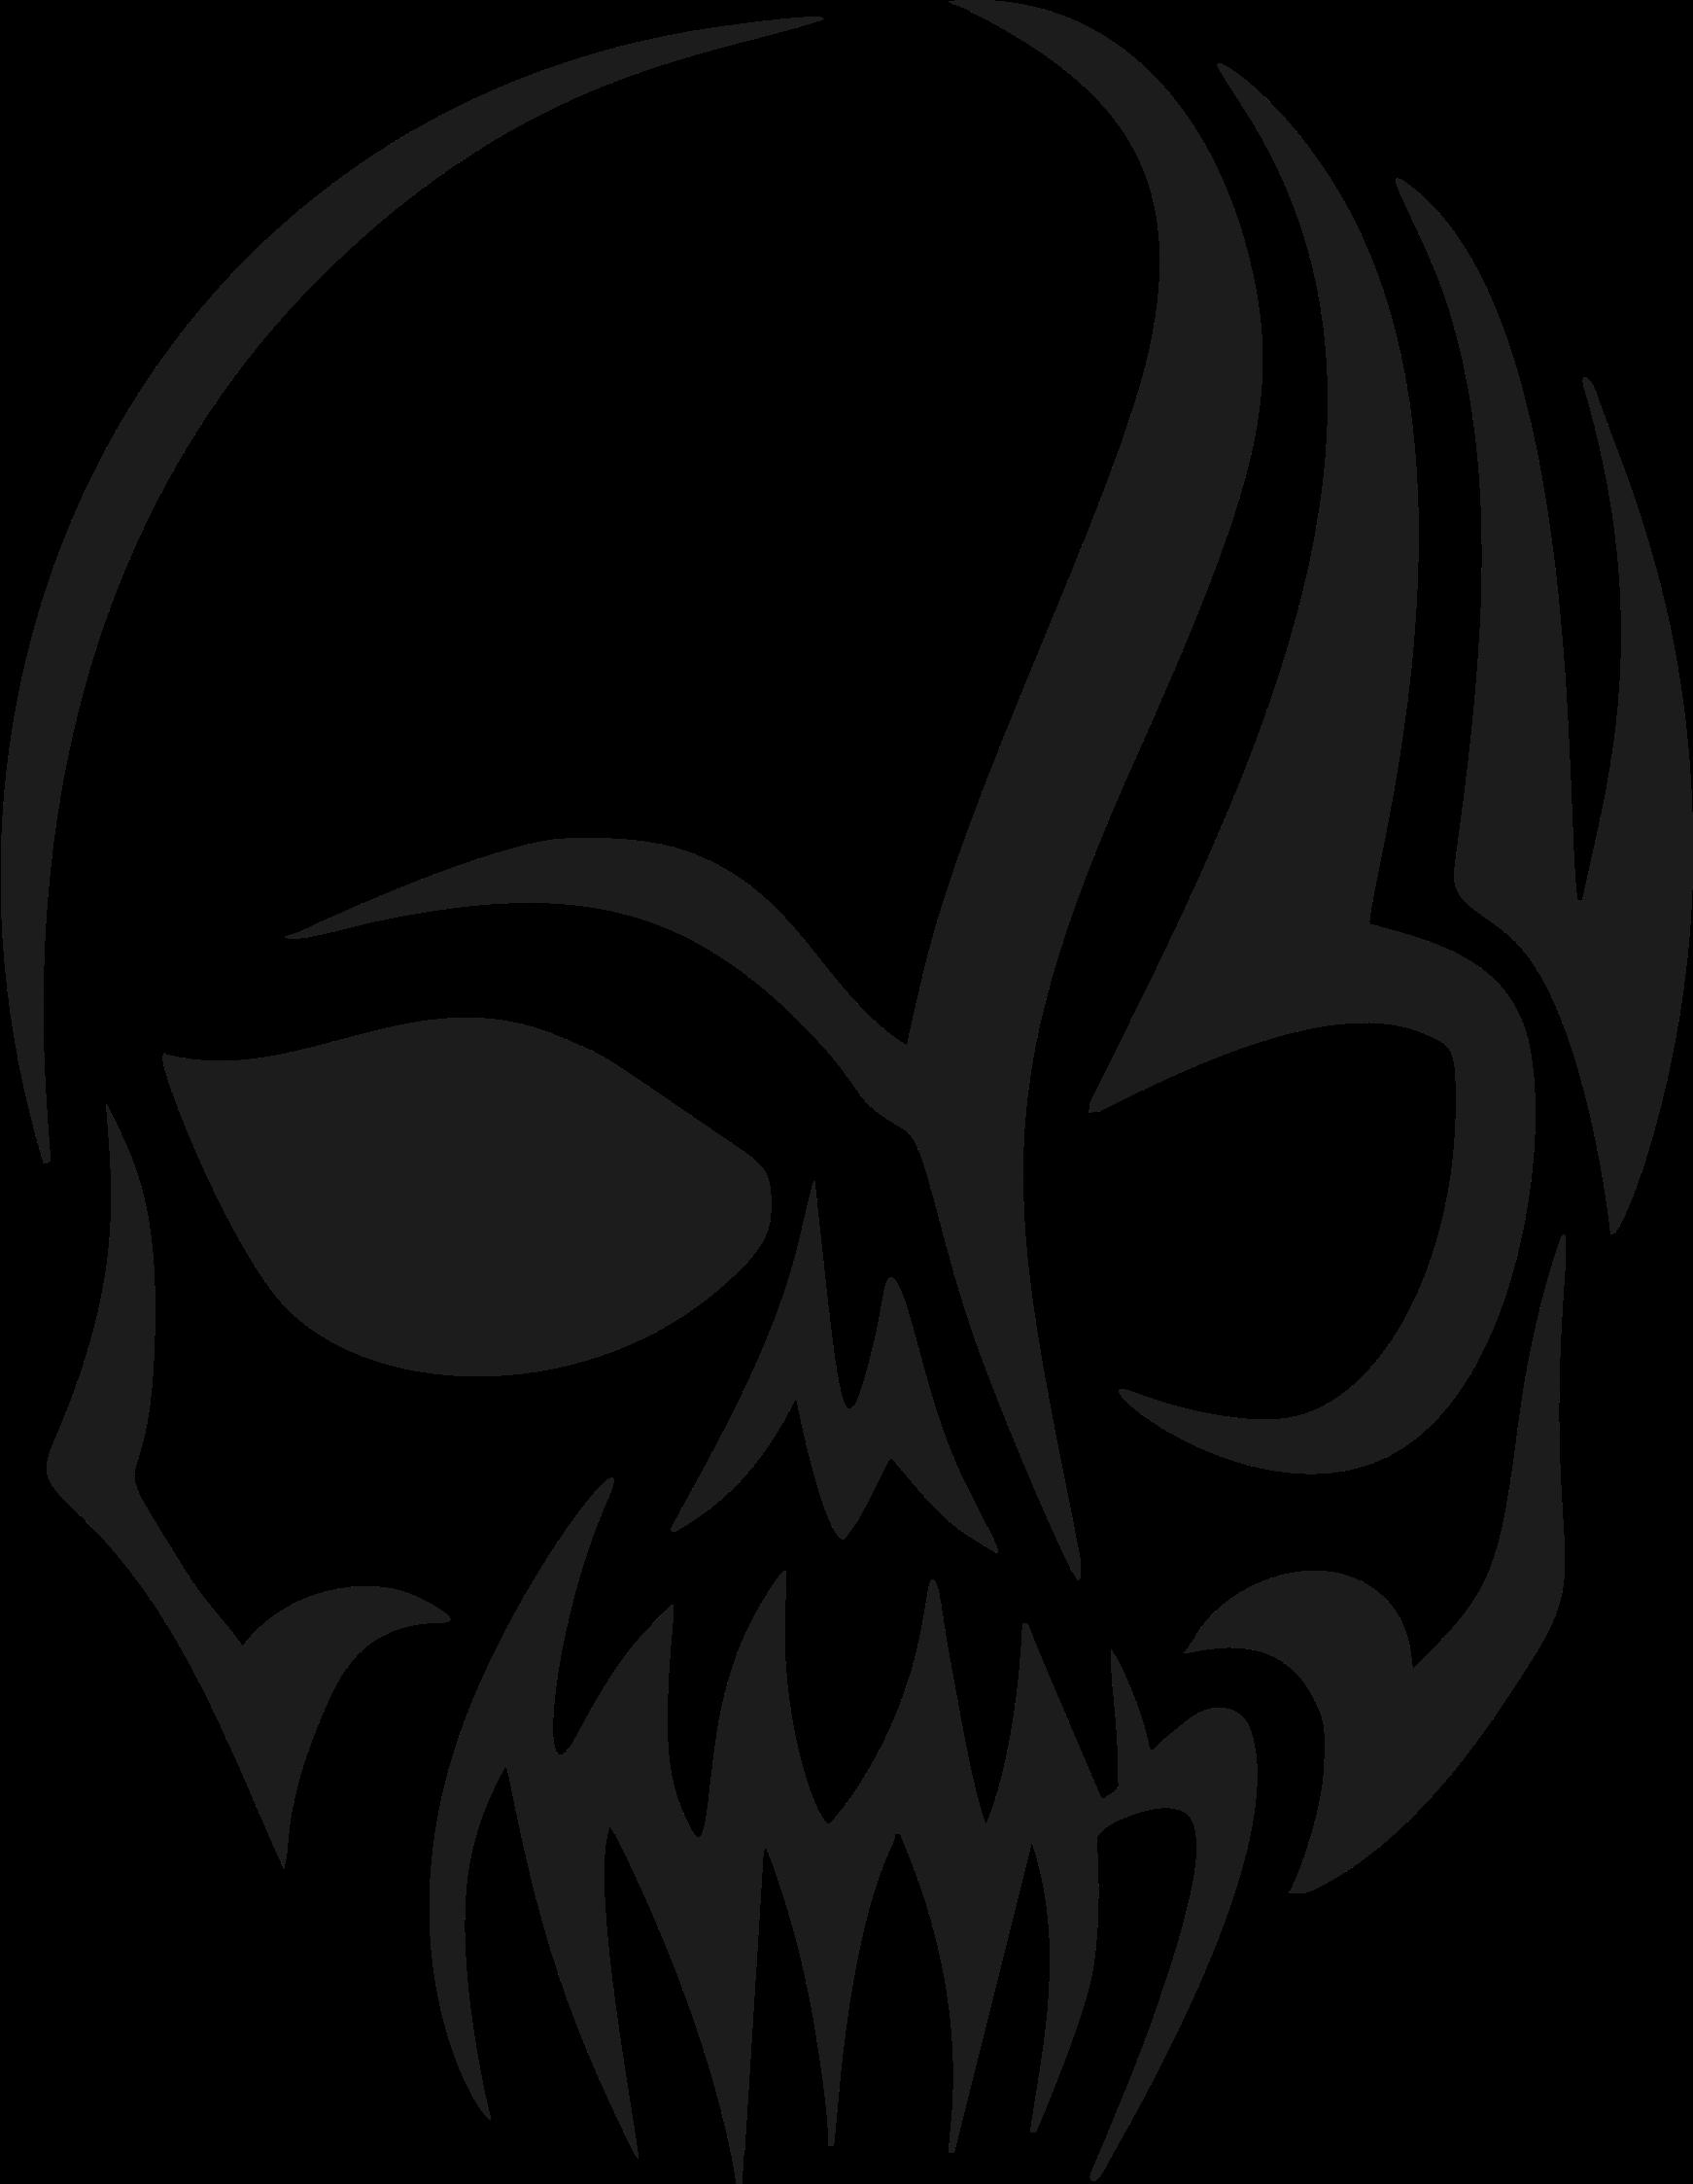 1742x2247 Tribal Skull Silhouette By @gdj, Tribal Skull Silhouette